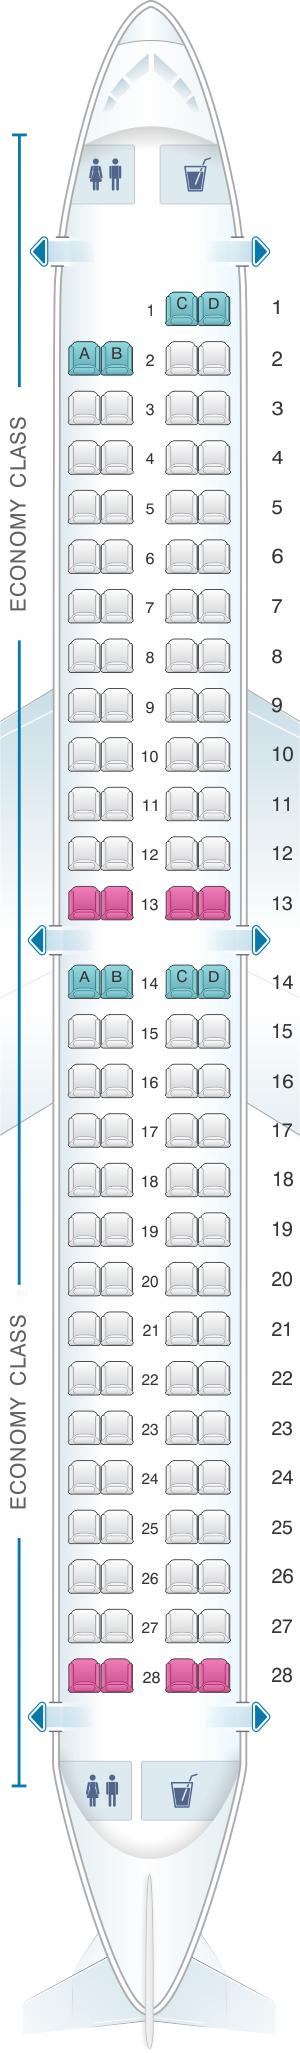 Seat map for AnadoluJet Embraer 190